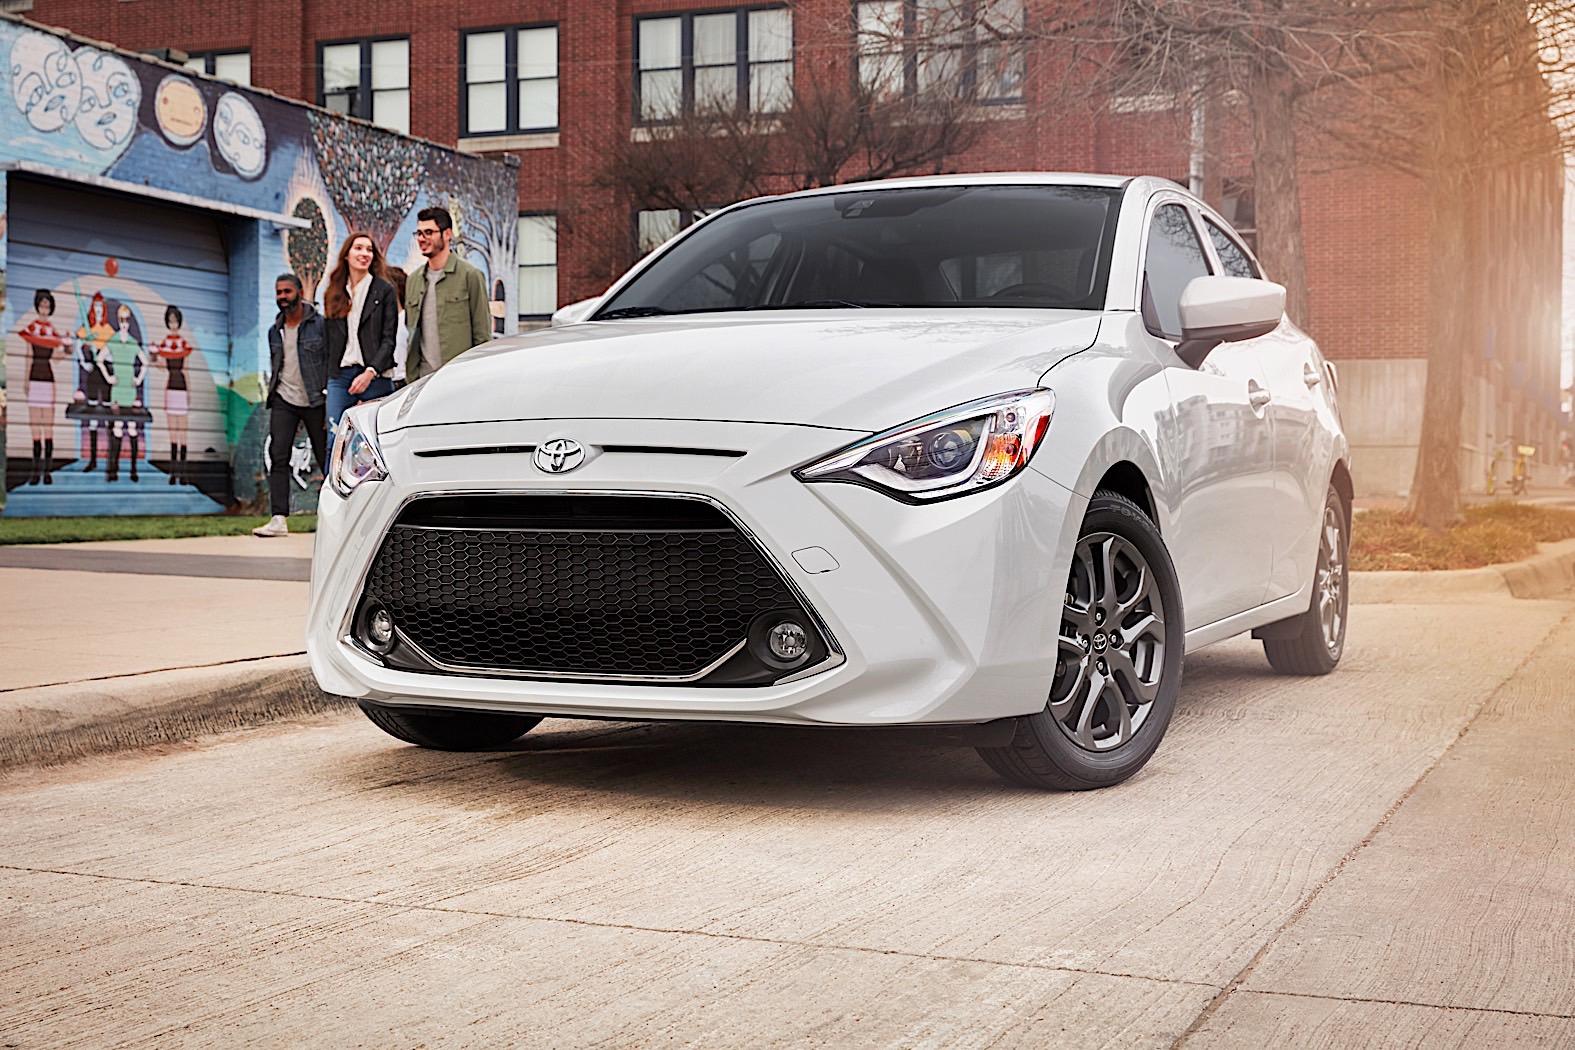 toyota yaris ia trd perbedaan grand new avanza 1.3 dan 1.5 becomes sedan for 2019 model year autoevolution 4 photos